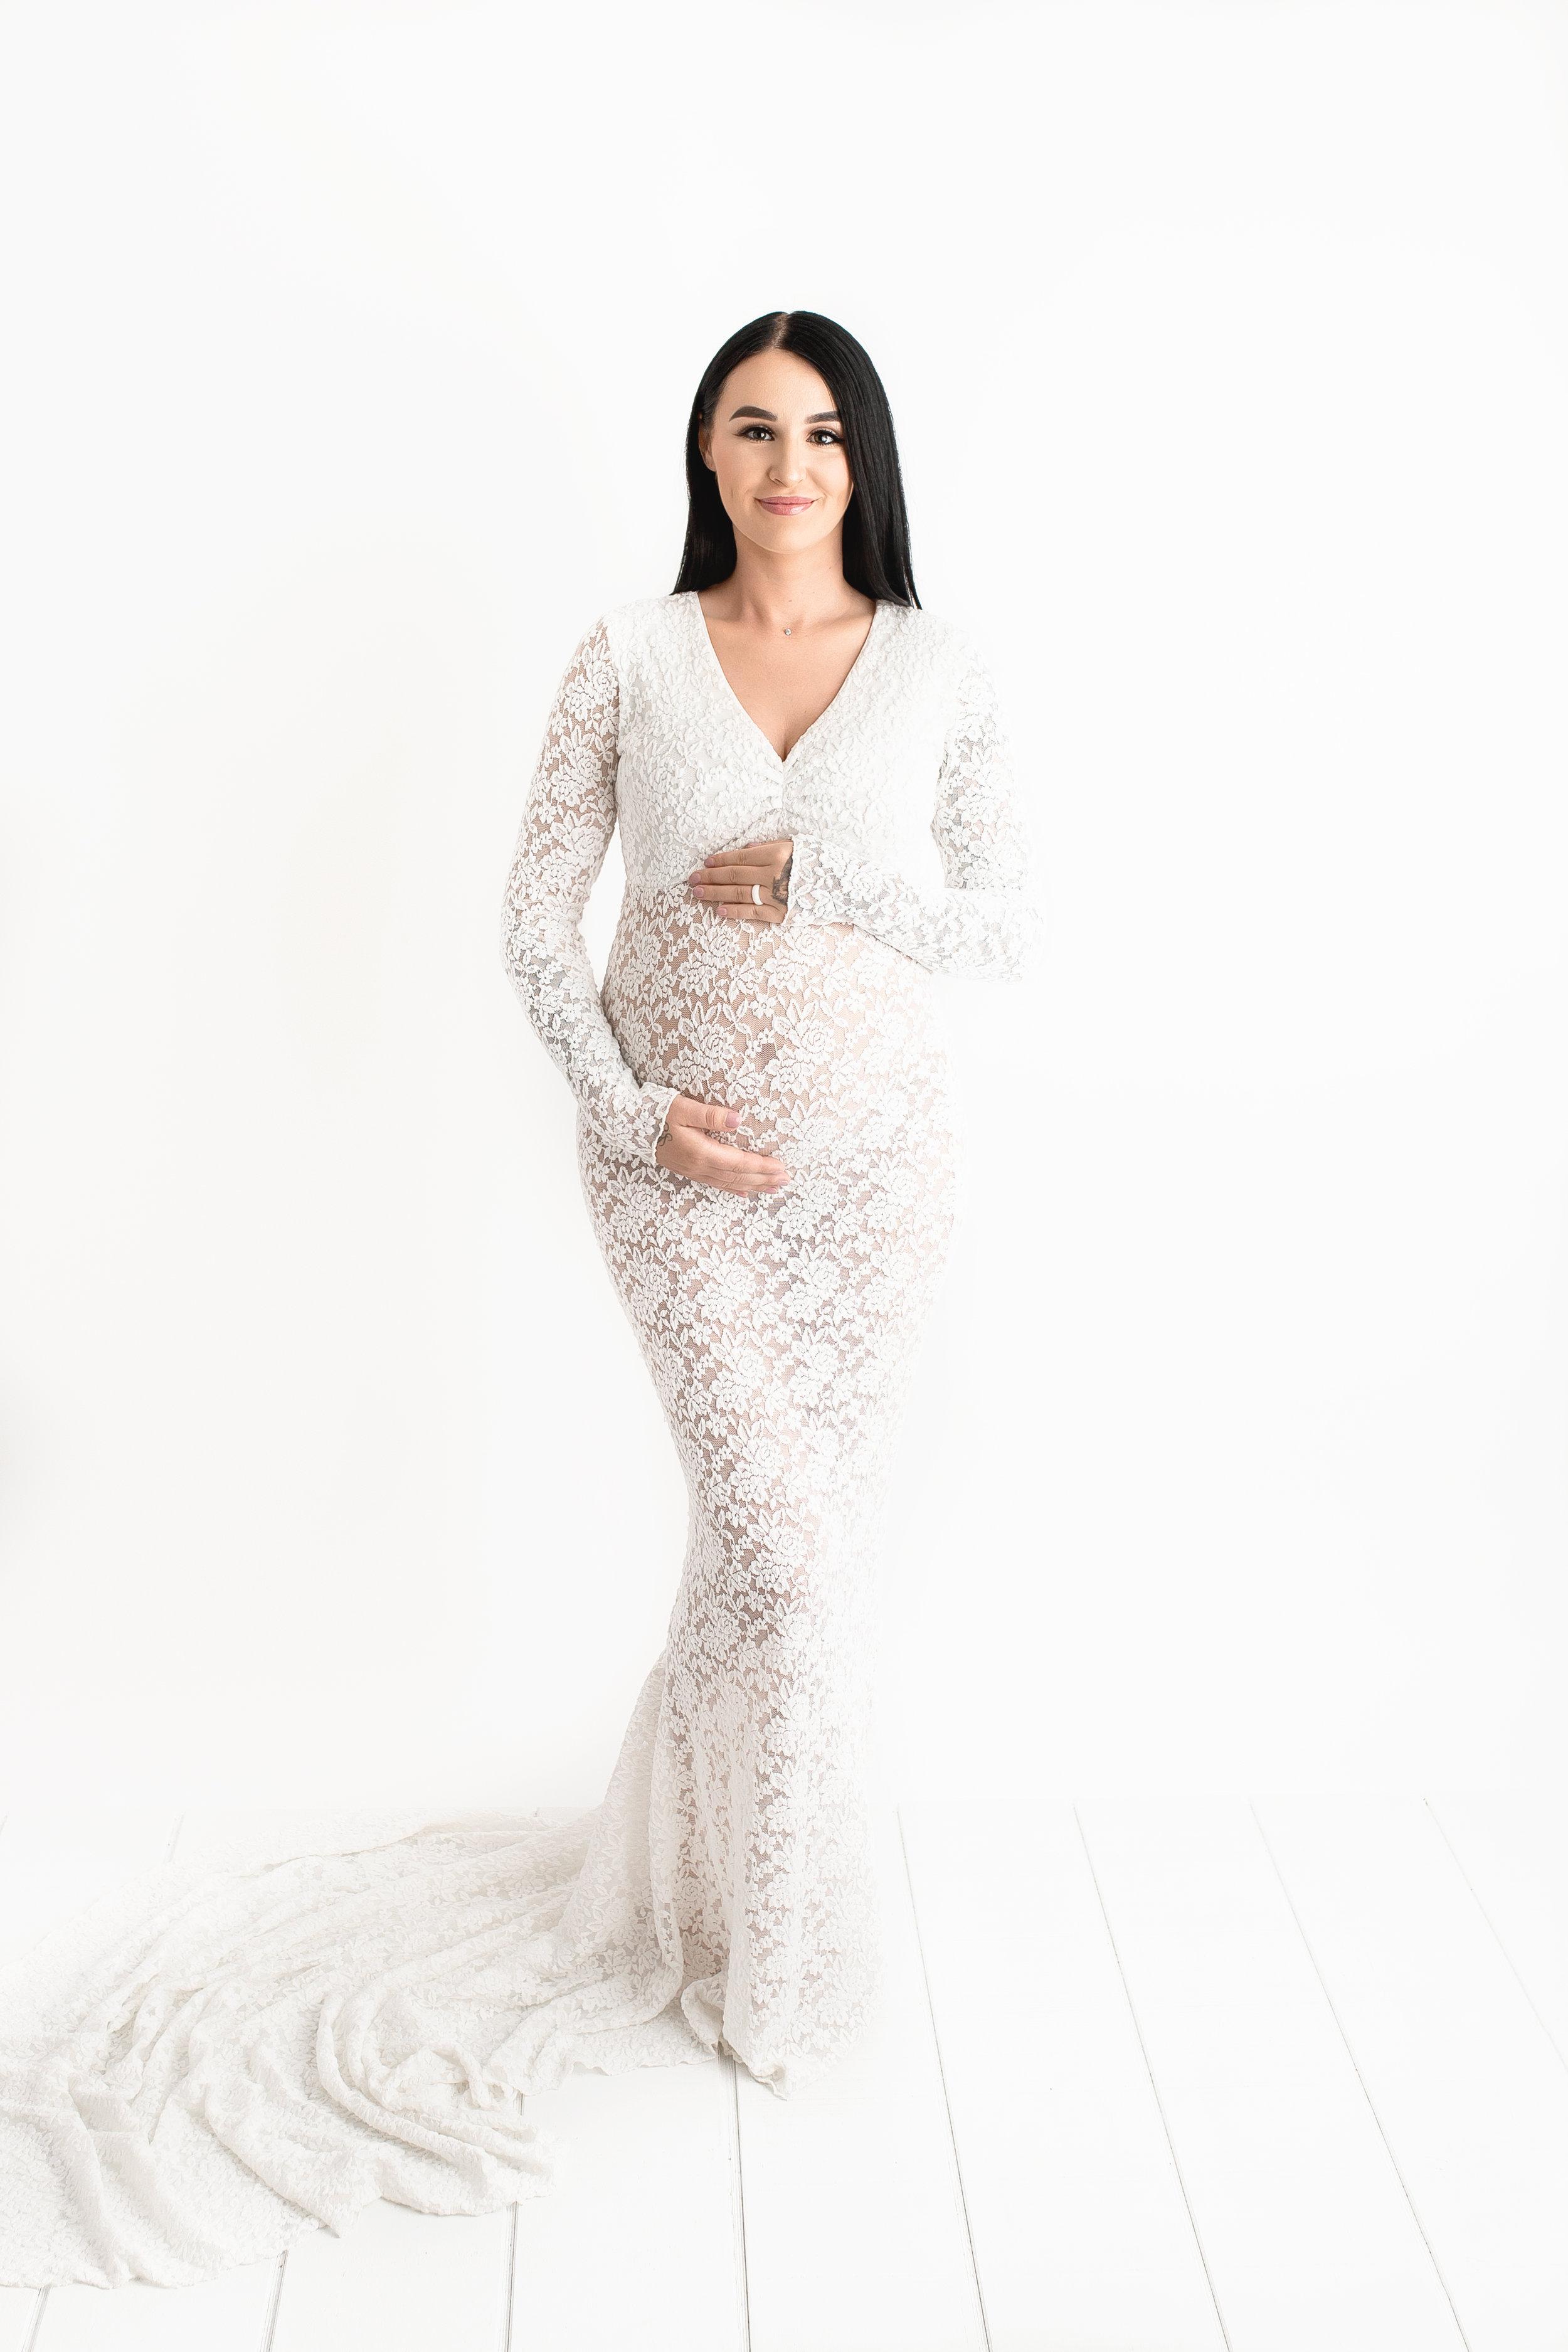 best maternity photographer edmonton